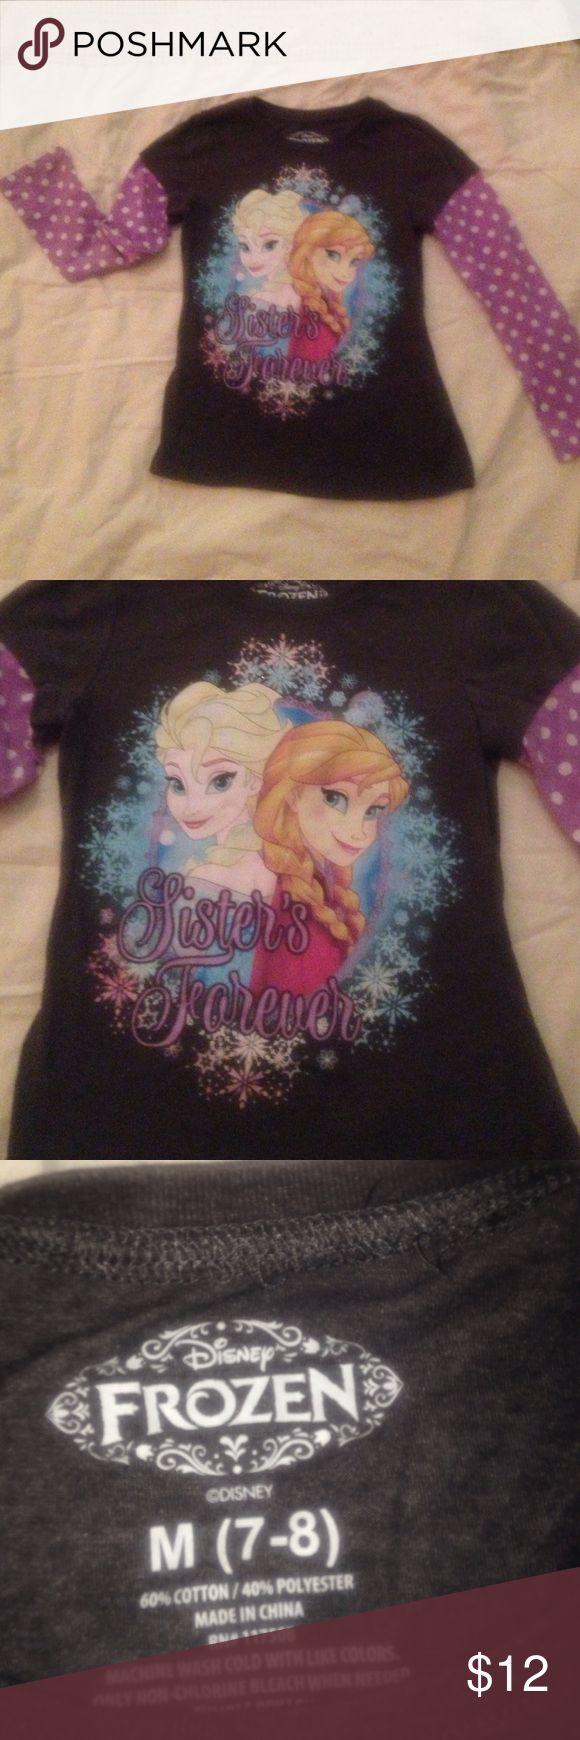 Disney Frozen Sisters Forever Tee Size 7 Disney Frozen Sisters Forever Tee Size 7 Disney Shirts & Tops Tees - Long Sleeve